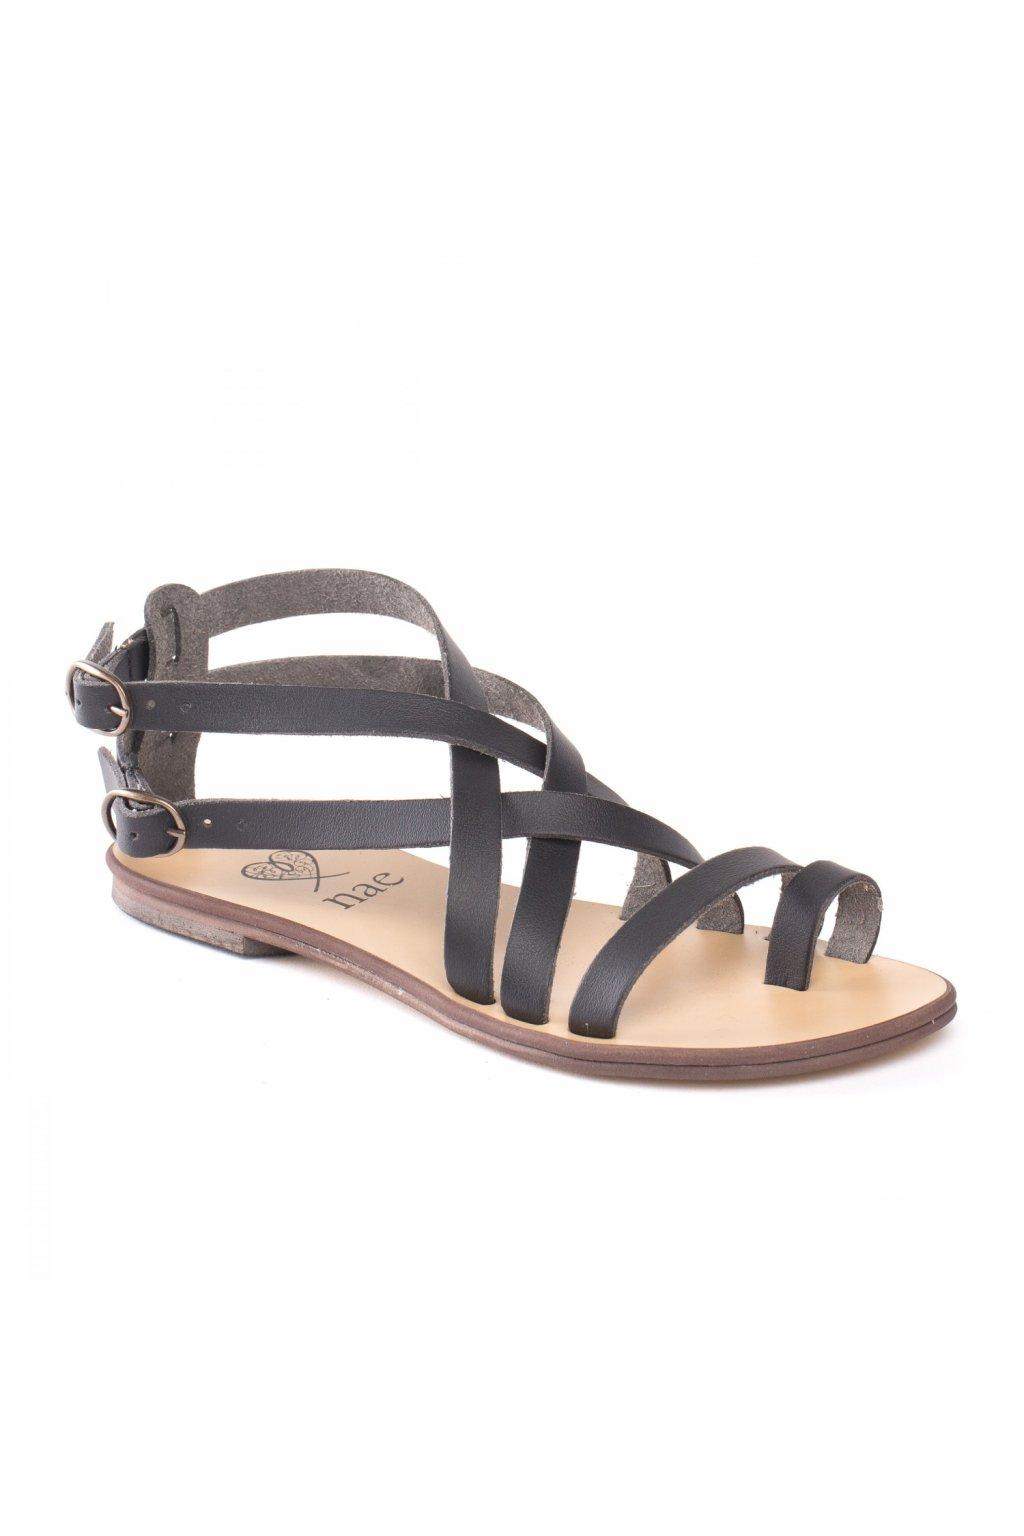 "Dámske čierne sandálky ""Itaca"""